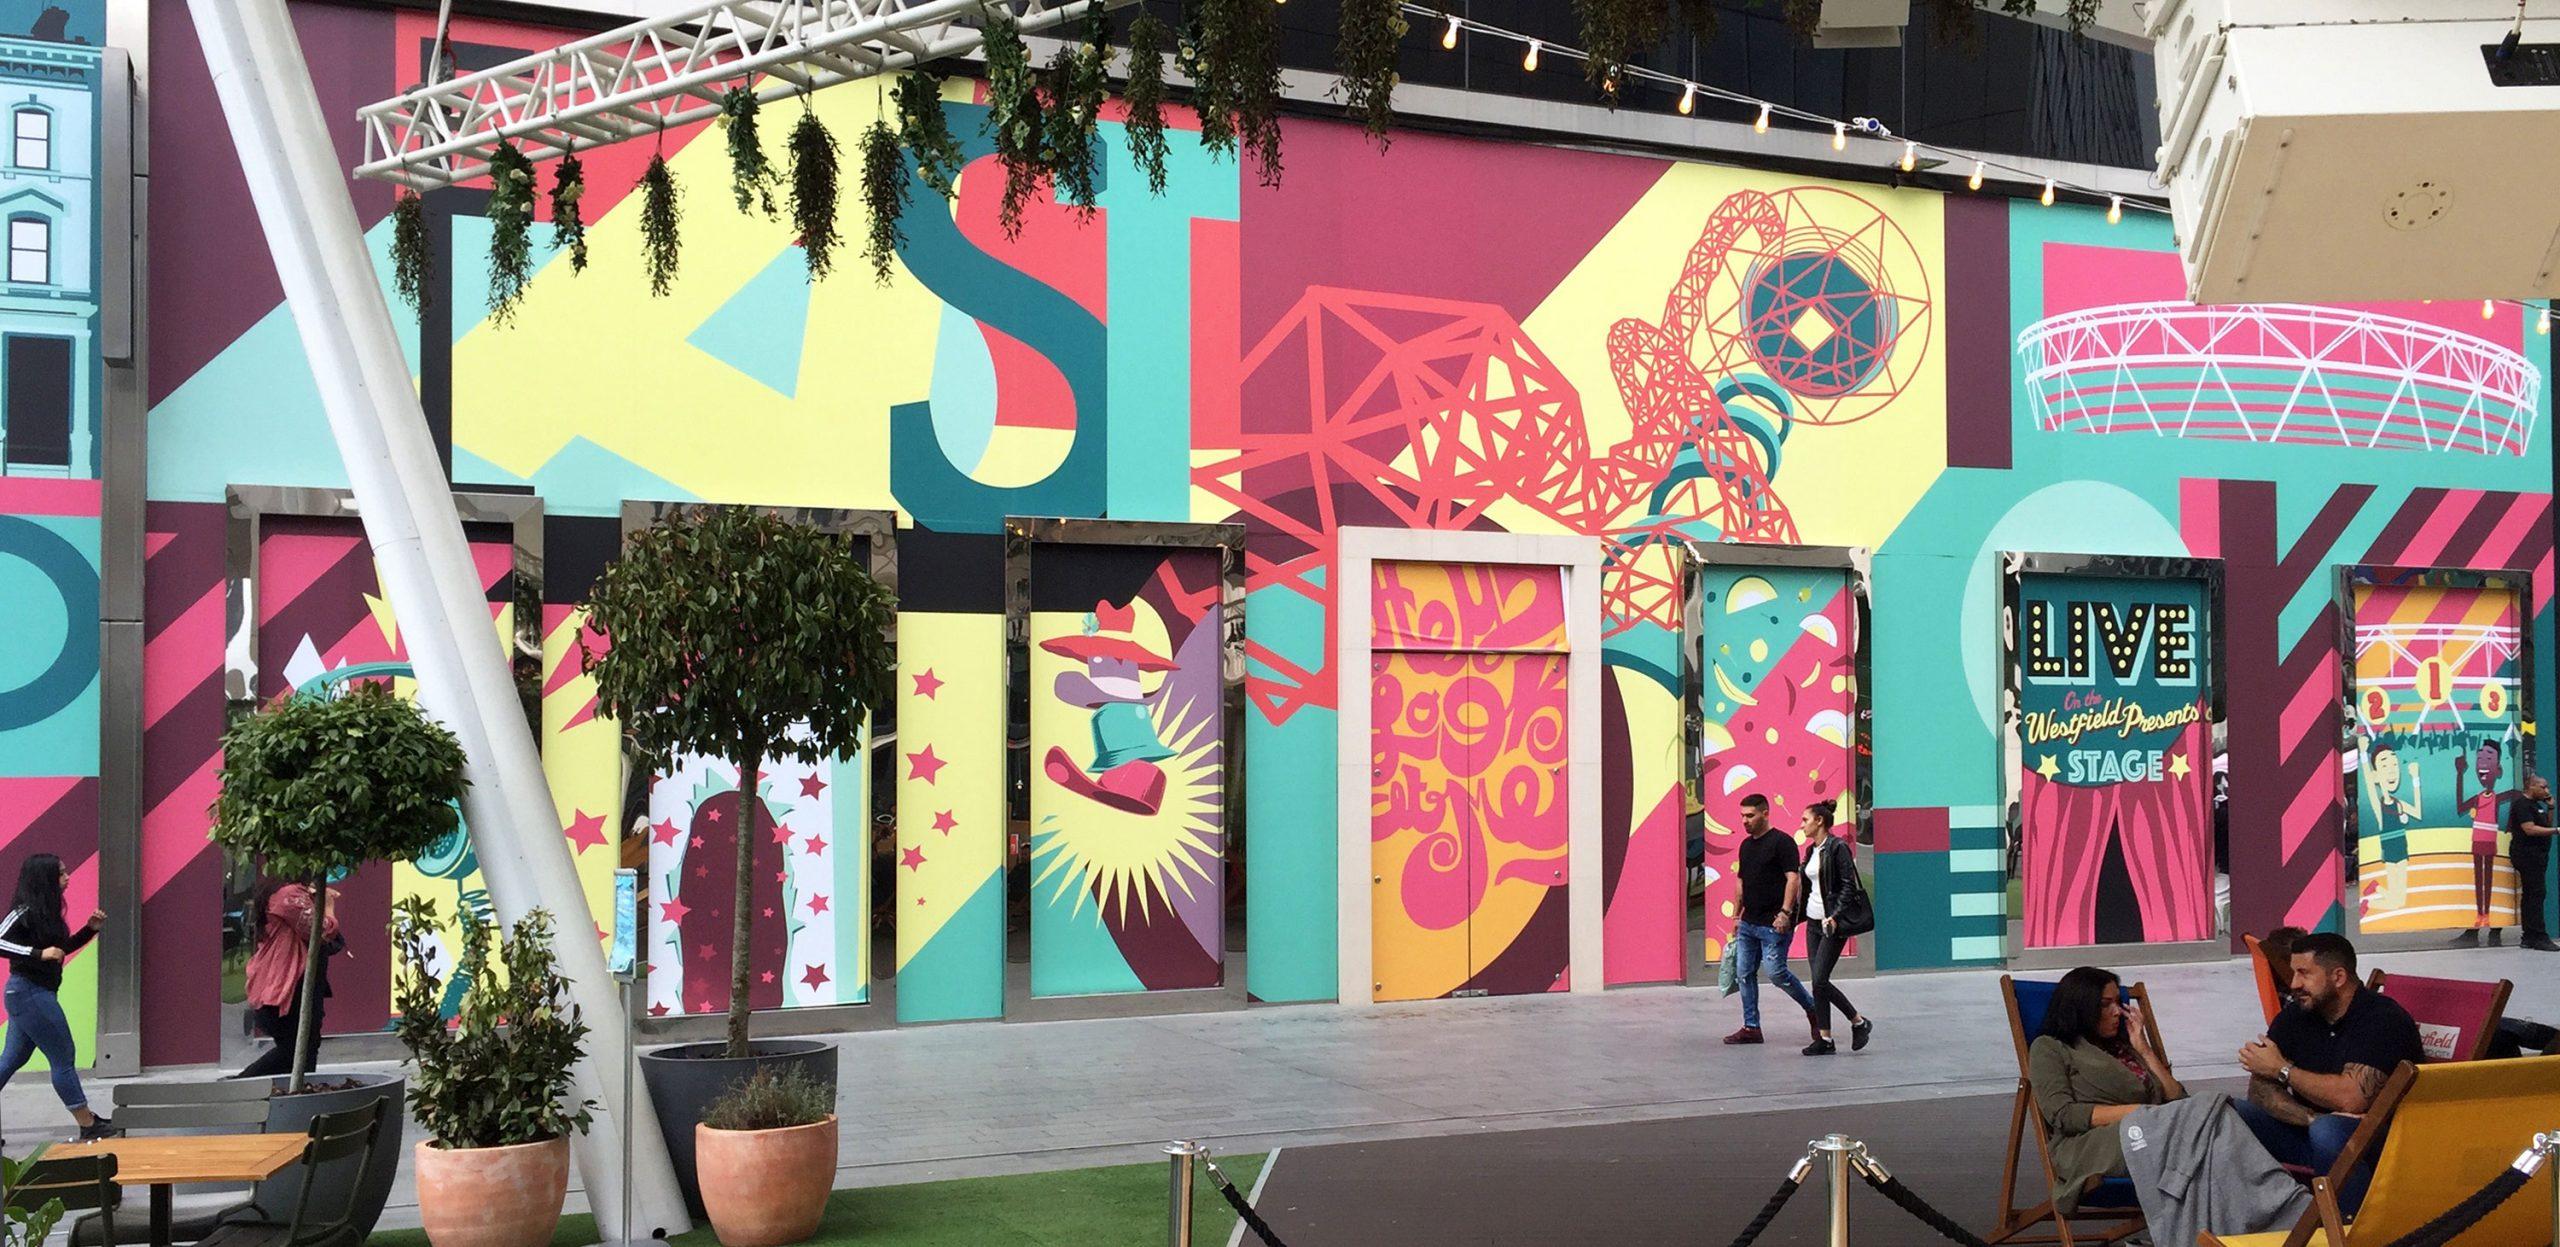 Westfield Stratford City London Vinyl Graphics Design And Graffiti Art By Paintshop Studio